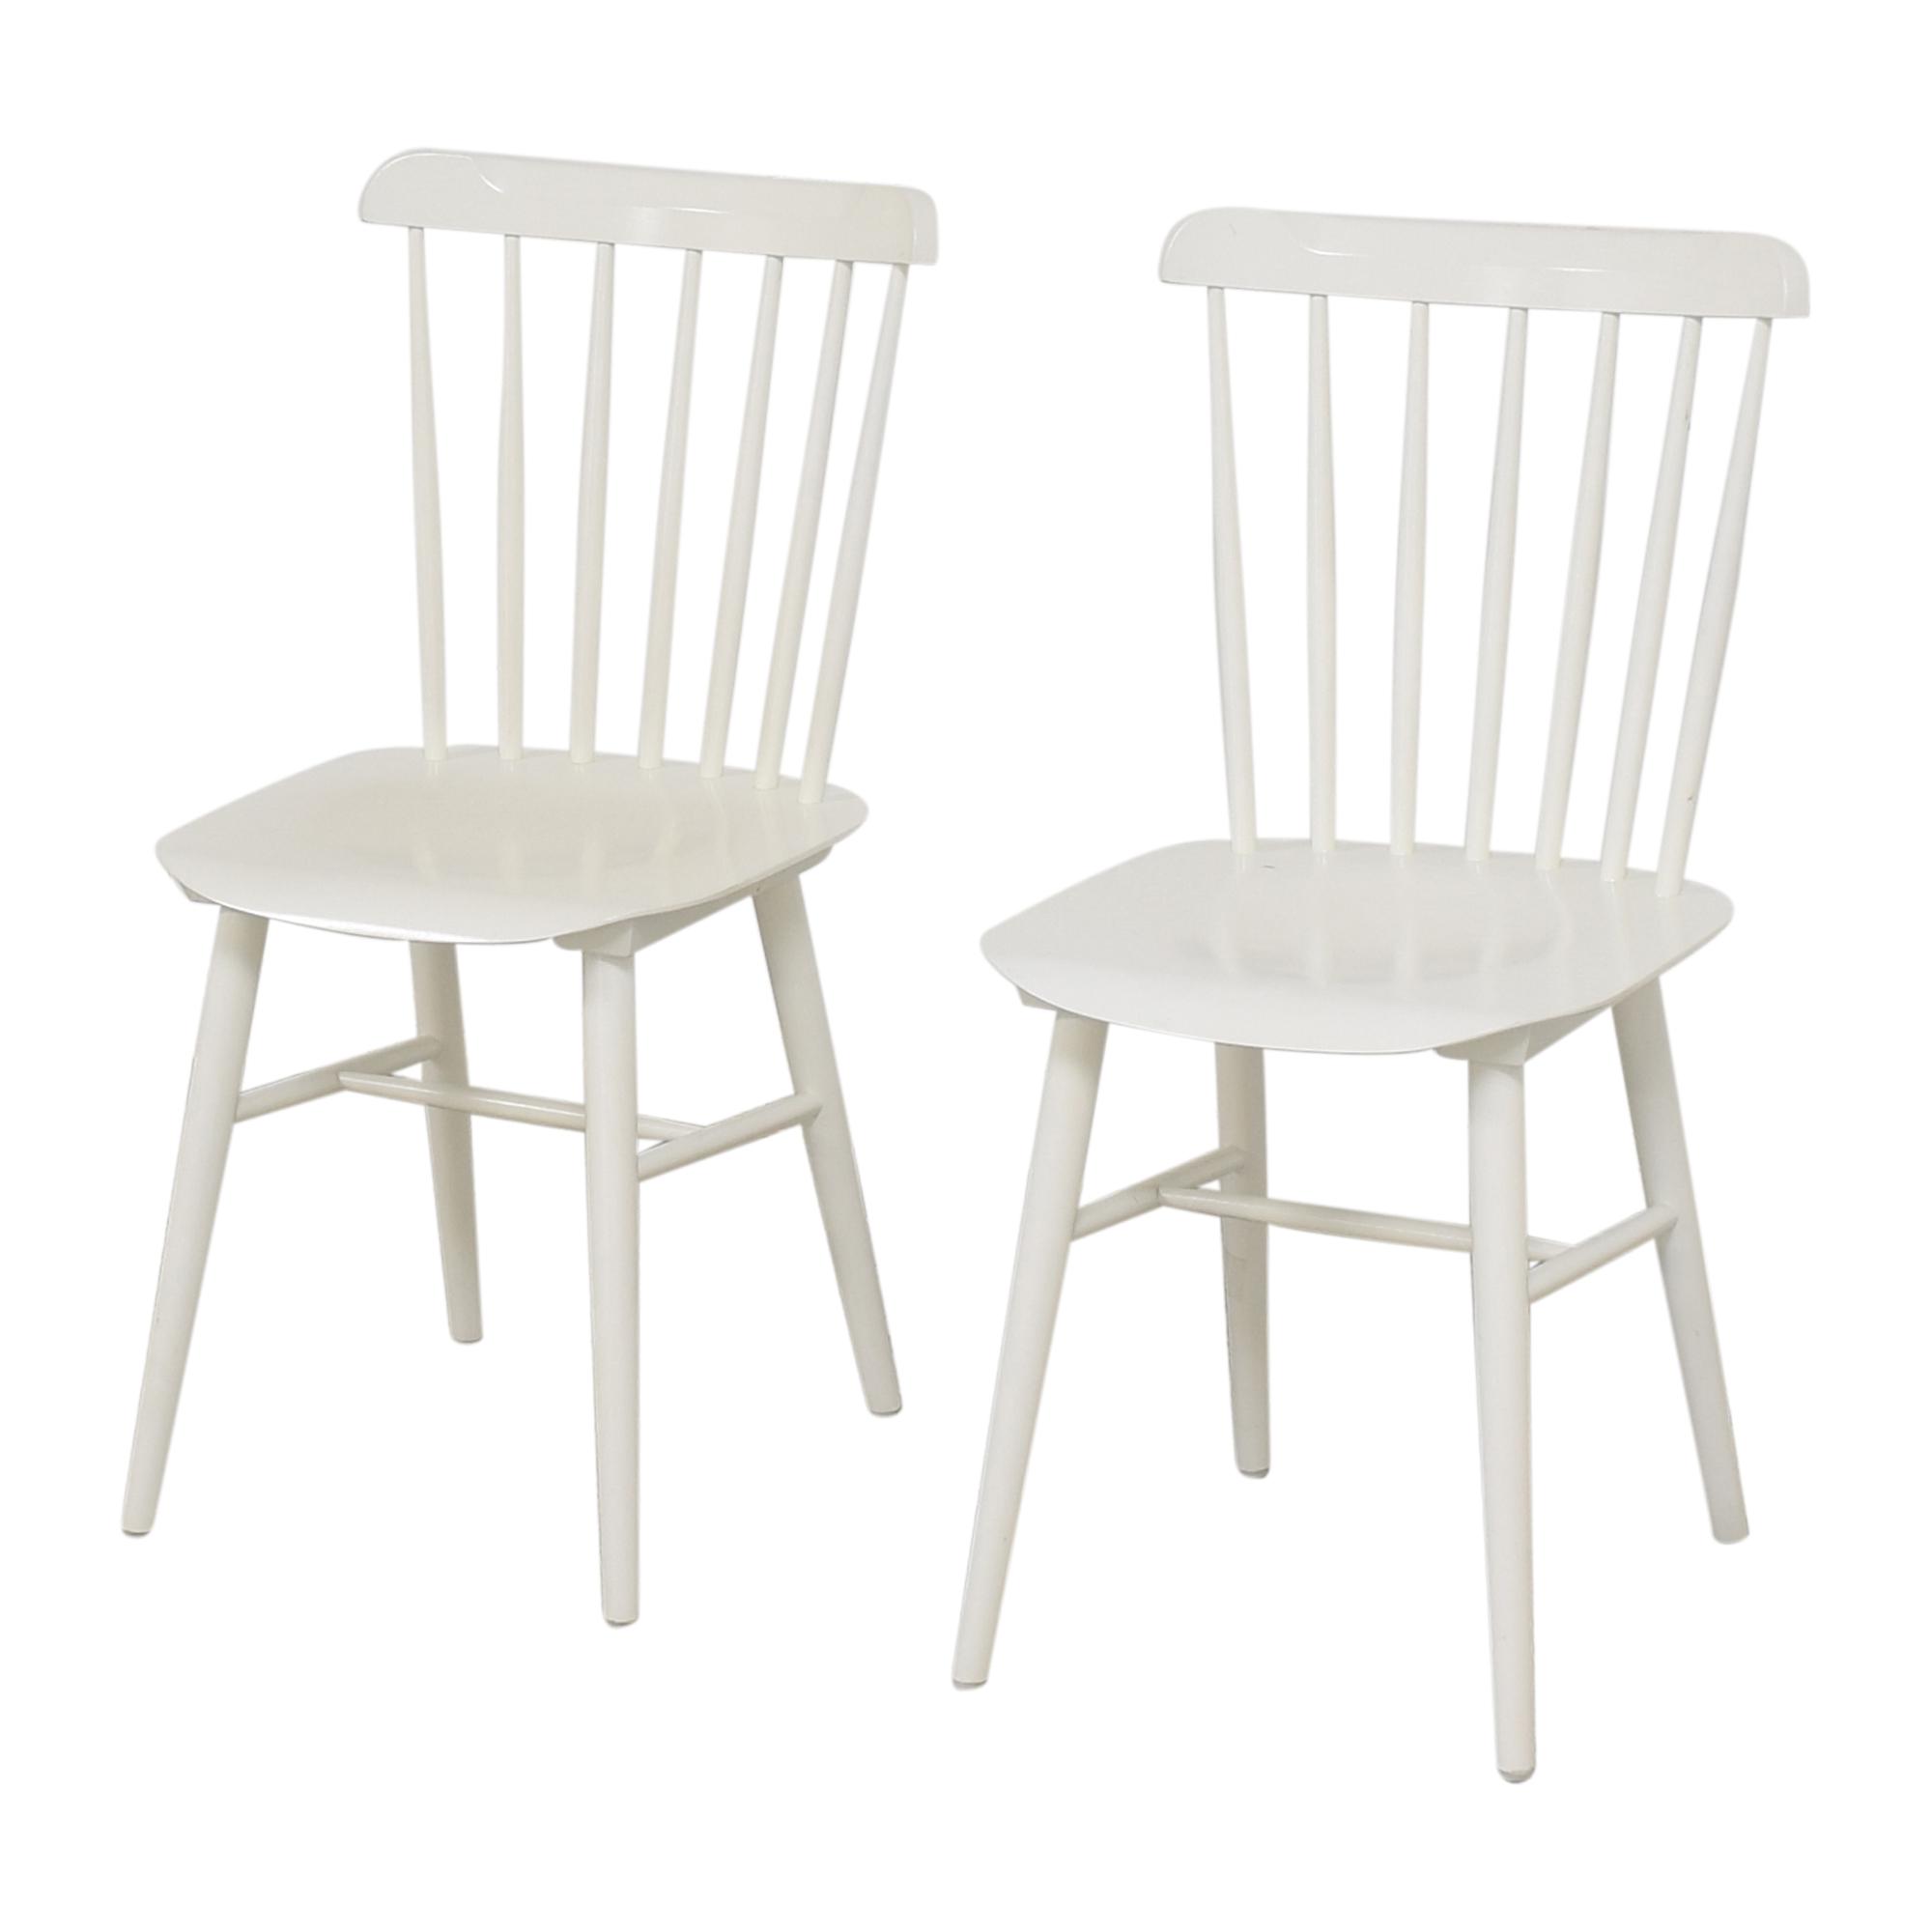 Design Within Reach Design Within Reach Salt Side Chairs price